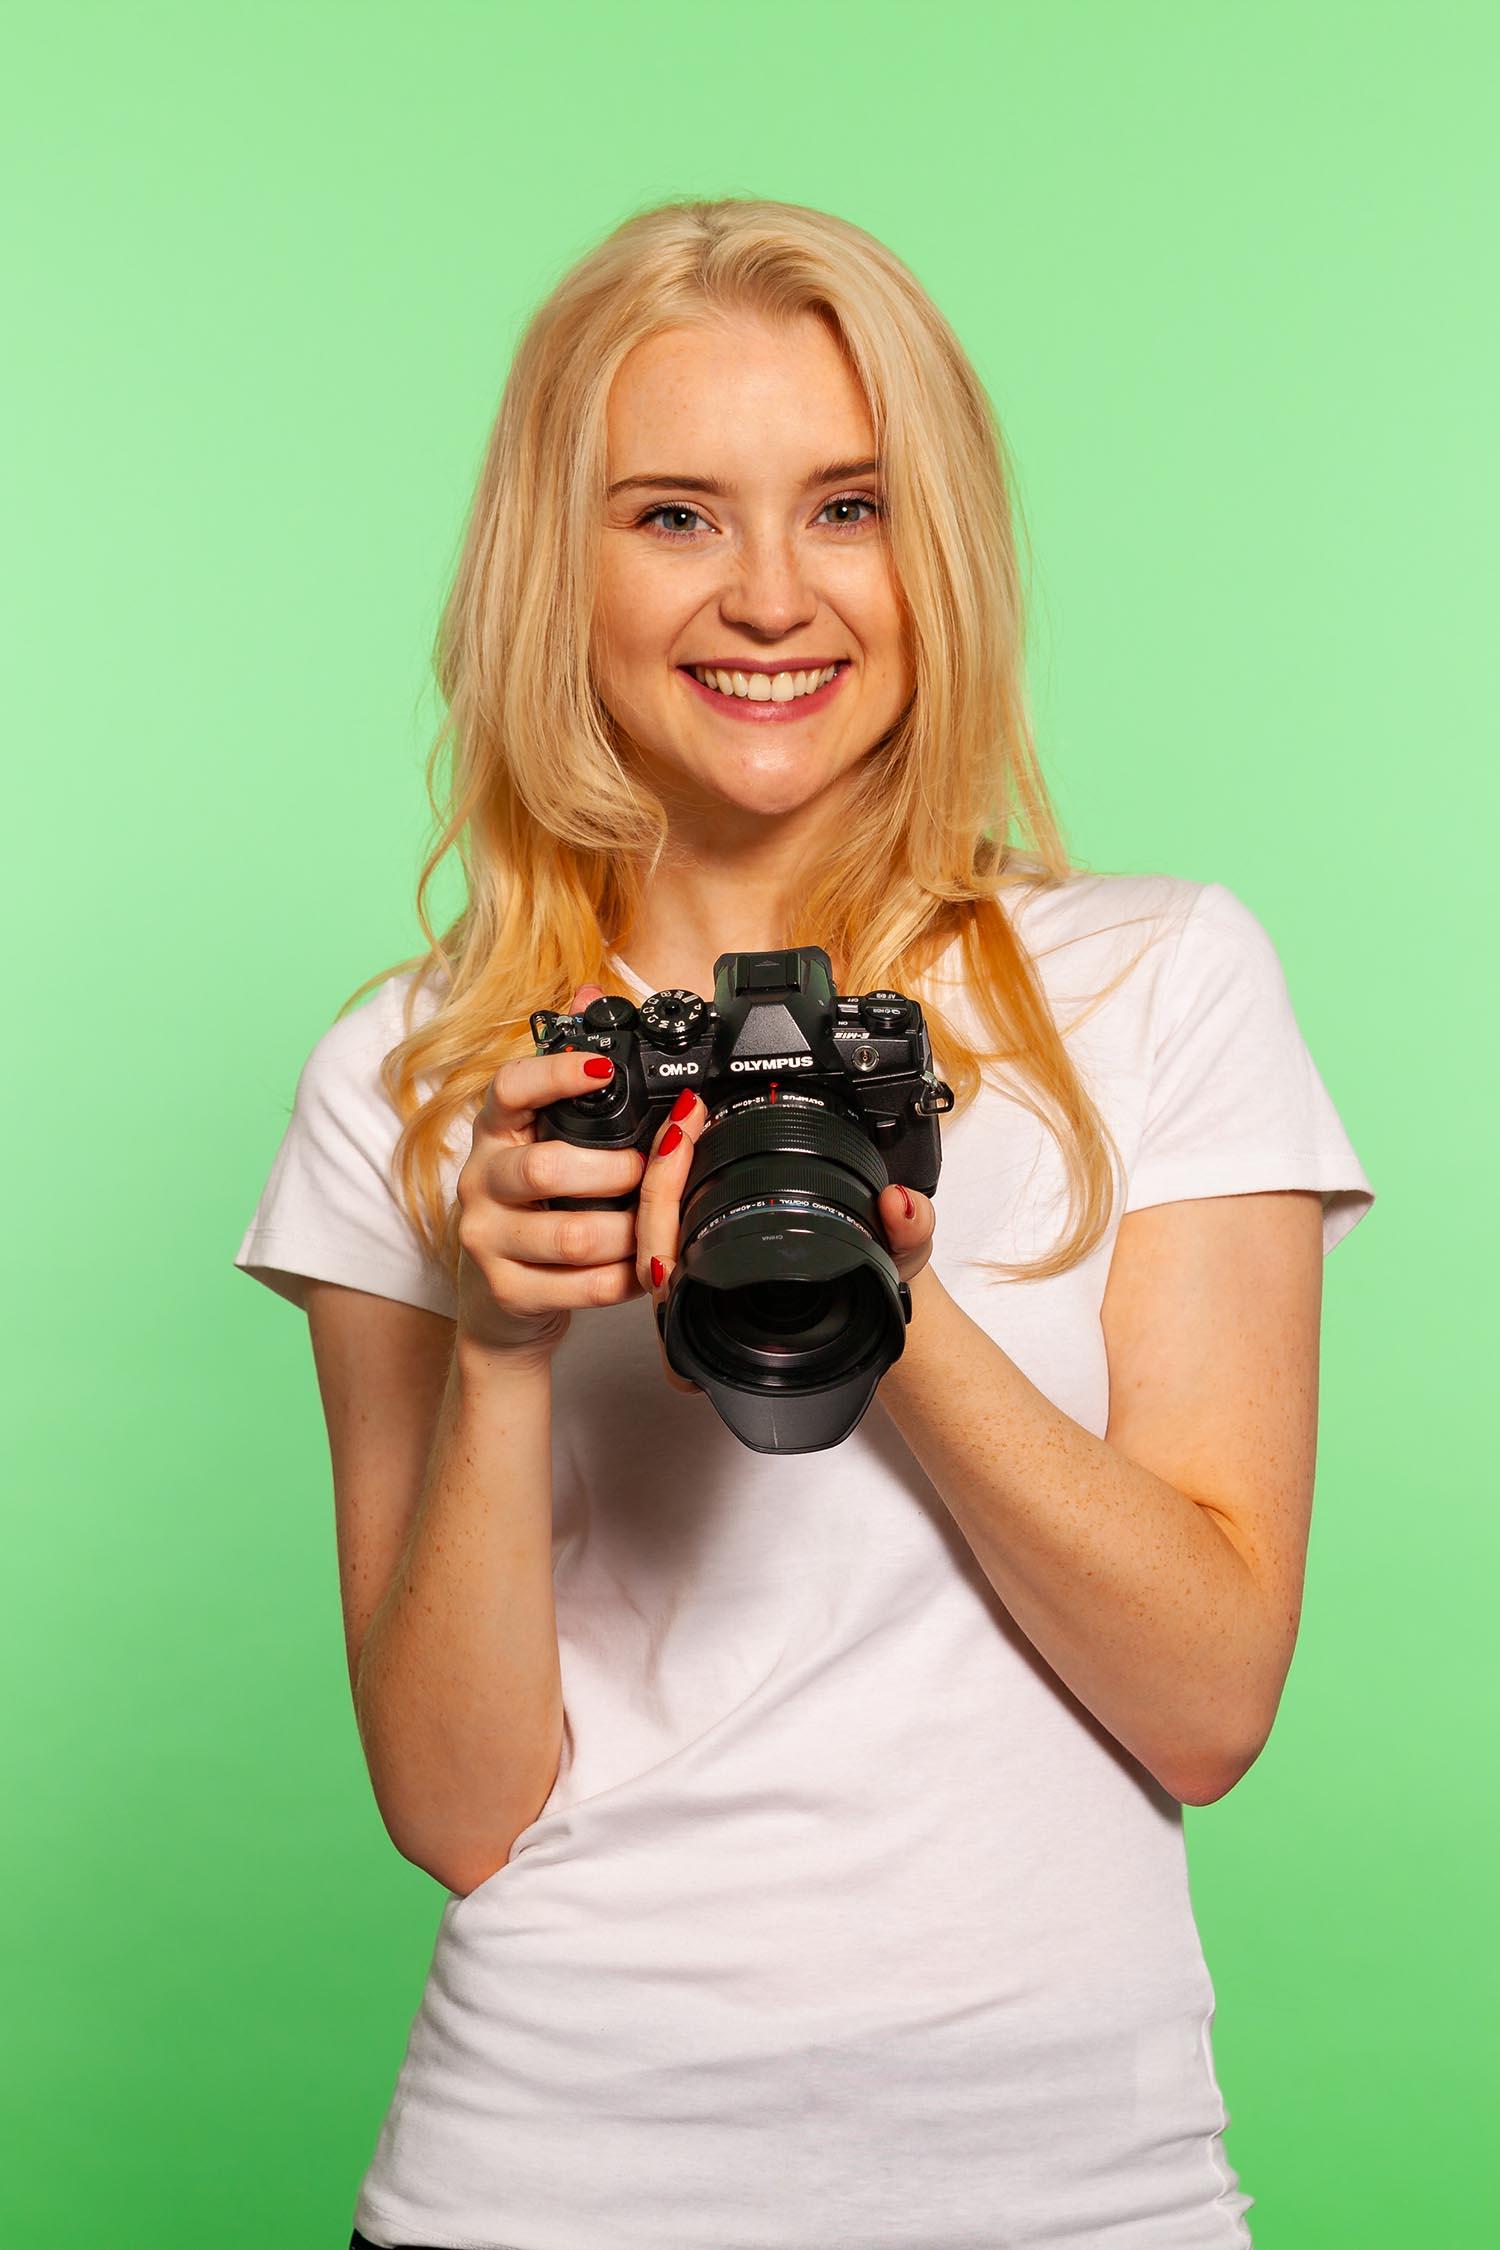 Model taken with Green Screen.